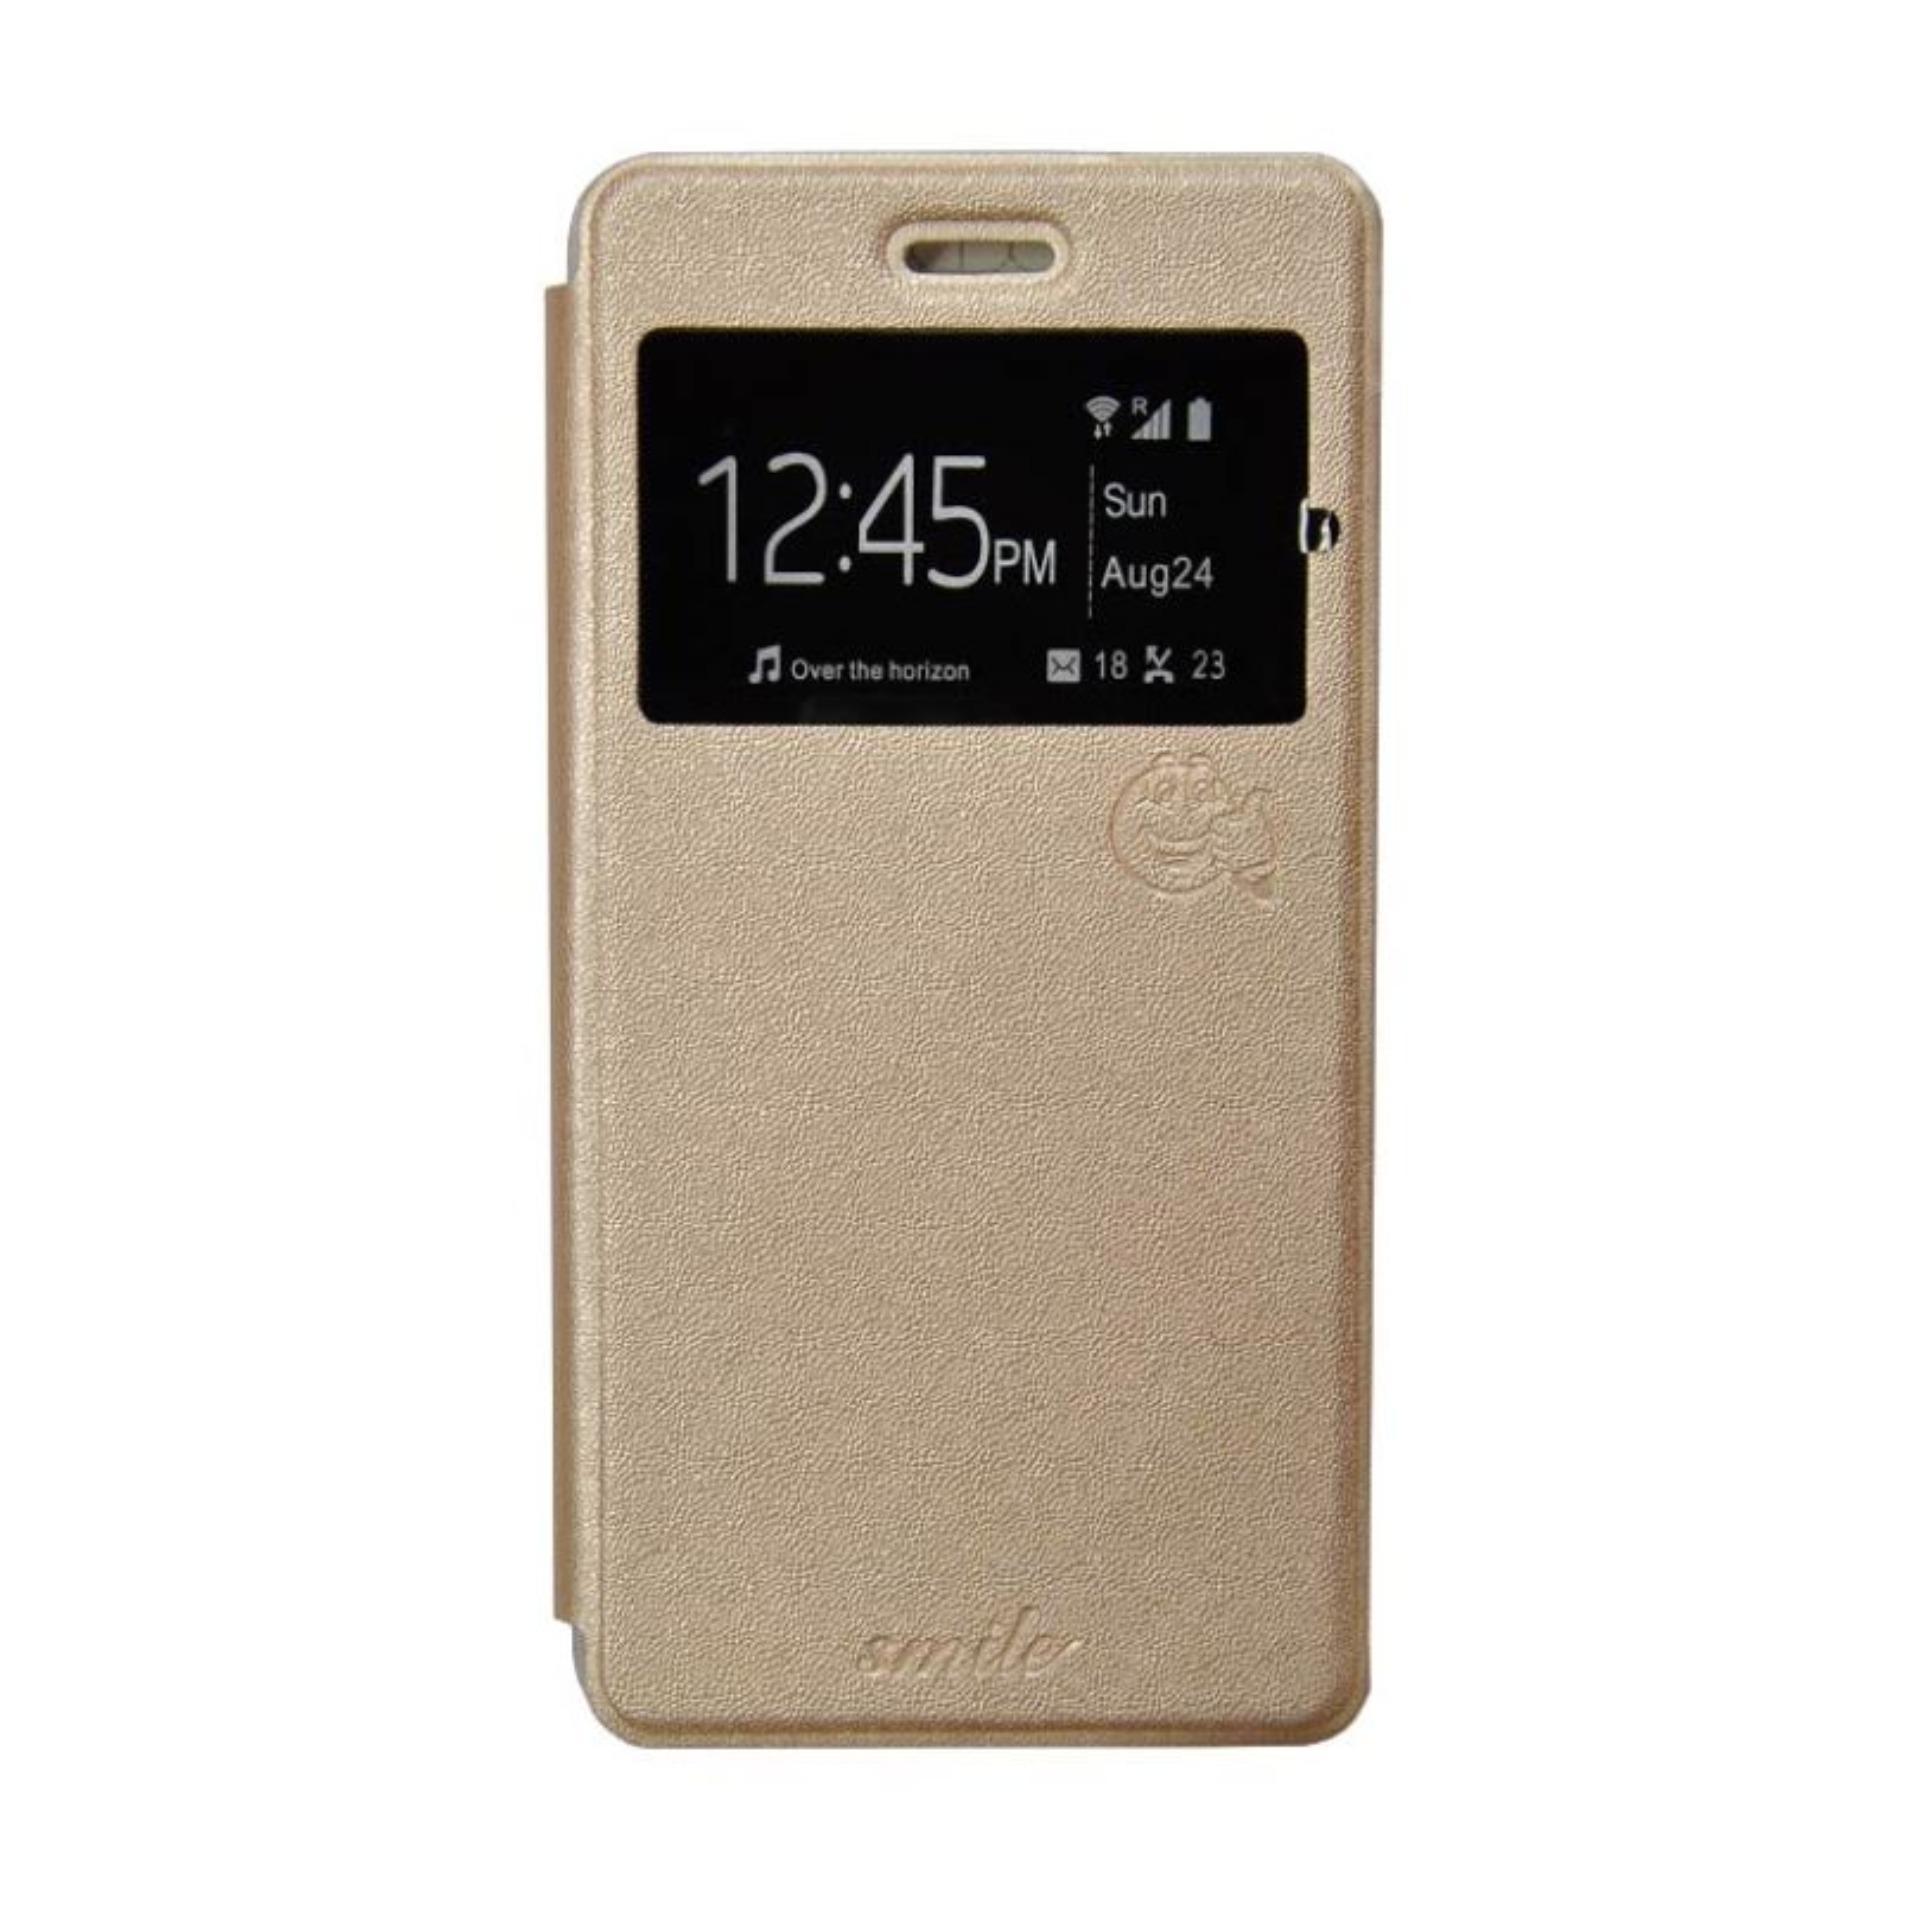 Aldora Case For LG K4 Flip Cover Case Dengan Pelindung Layar Smile Series - Gold